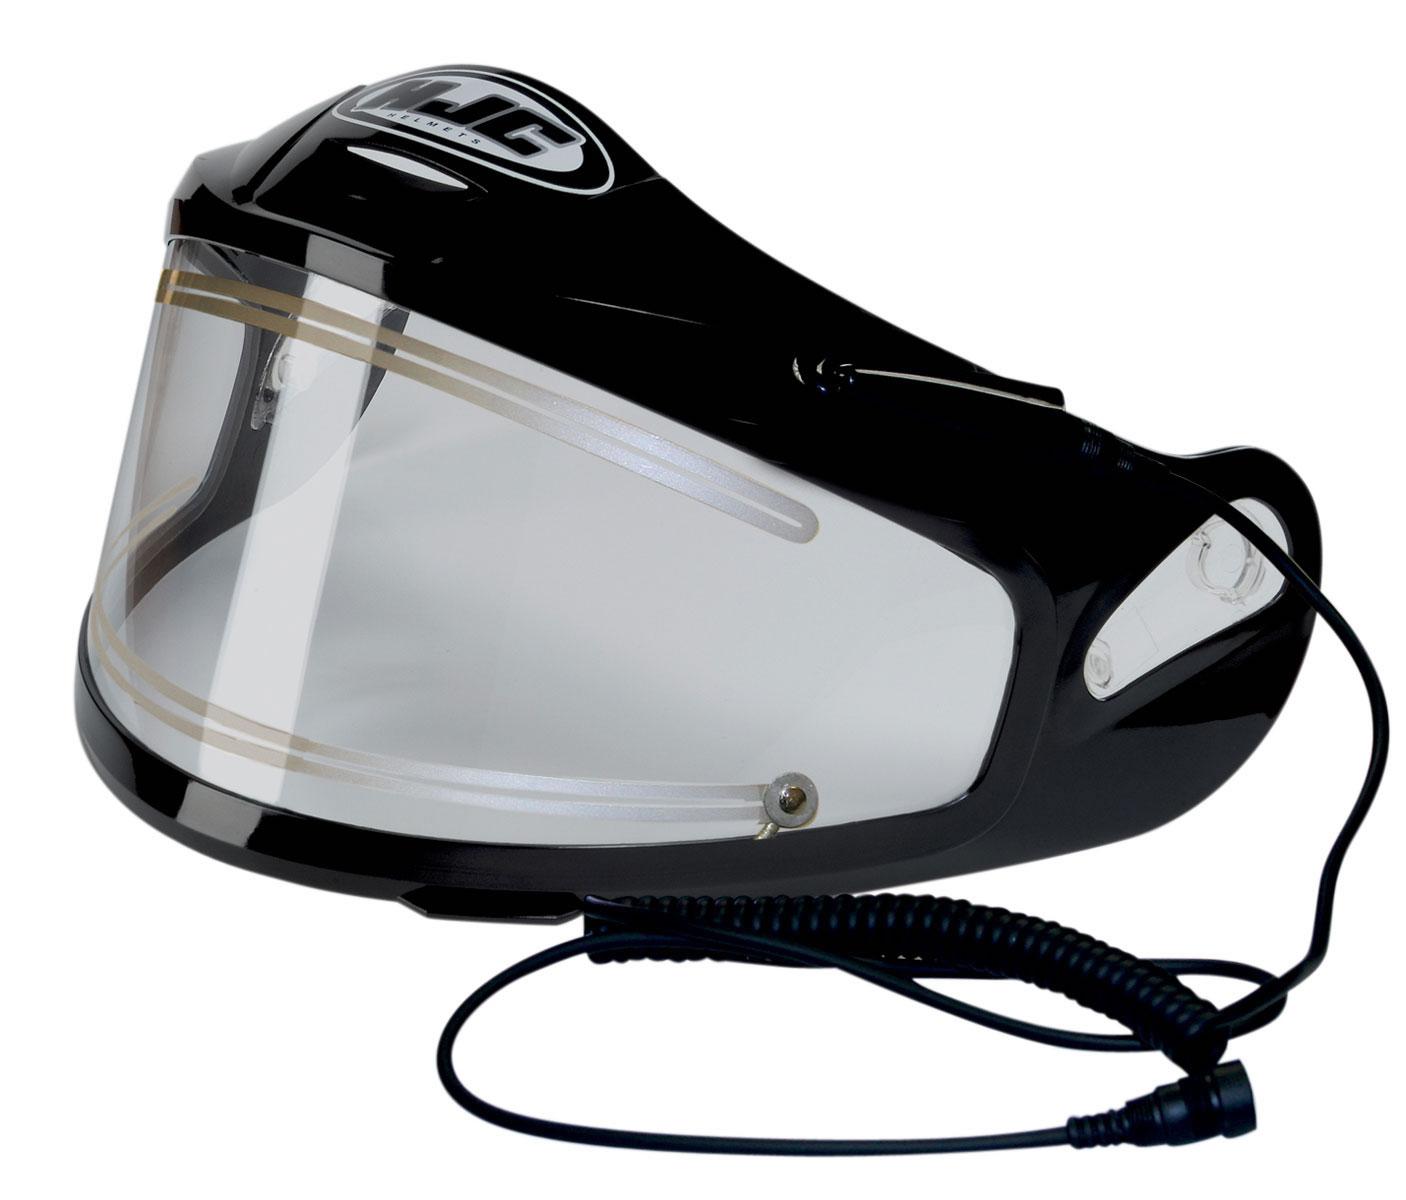 unled R Wiring Harness on fog light, universal painless, best street rod, fuel pump, hot rod,